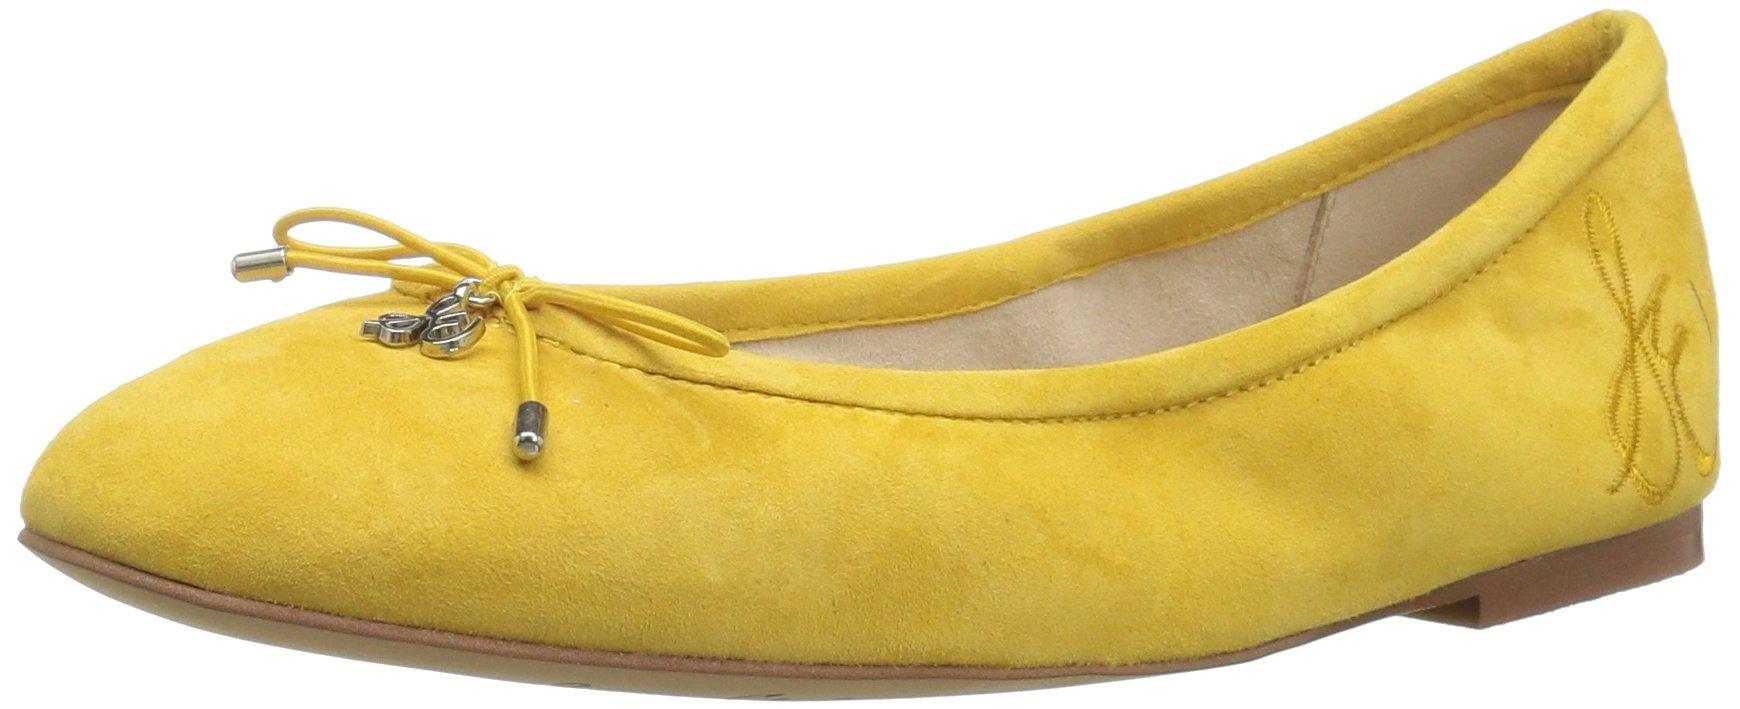 Sam Edelman Women's Felicia Ballet Flat, Sunset Yellow Suede, 8 M US